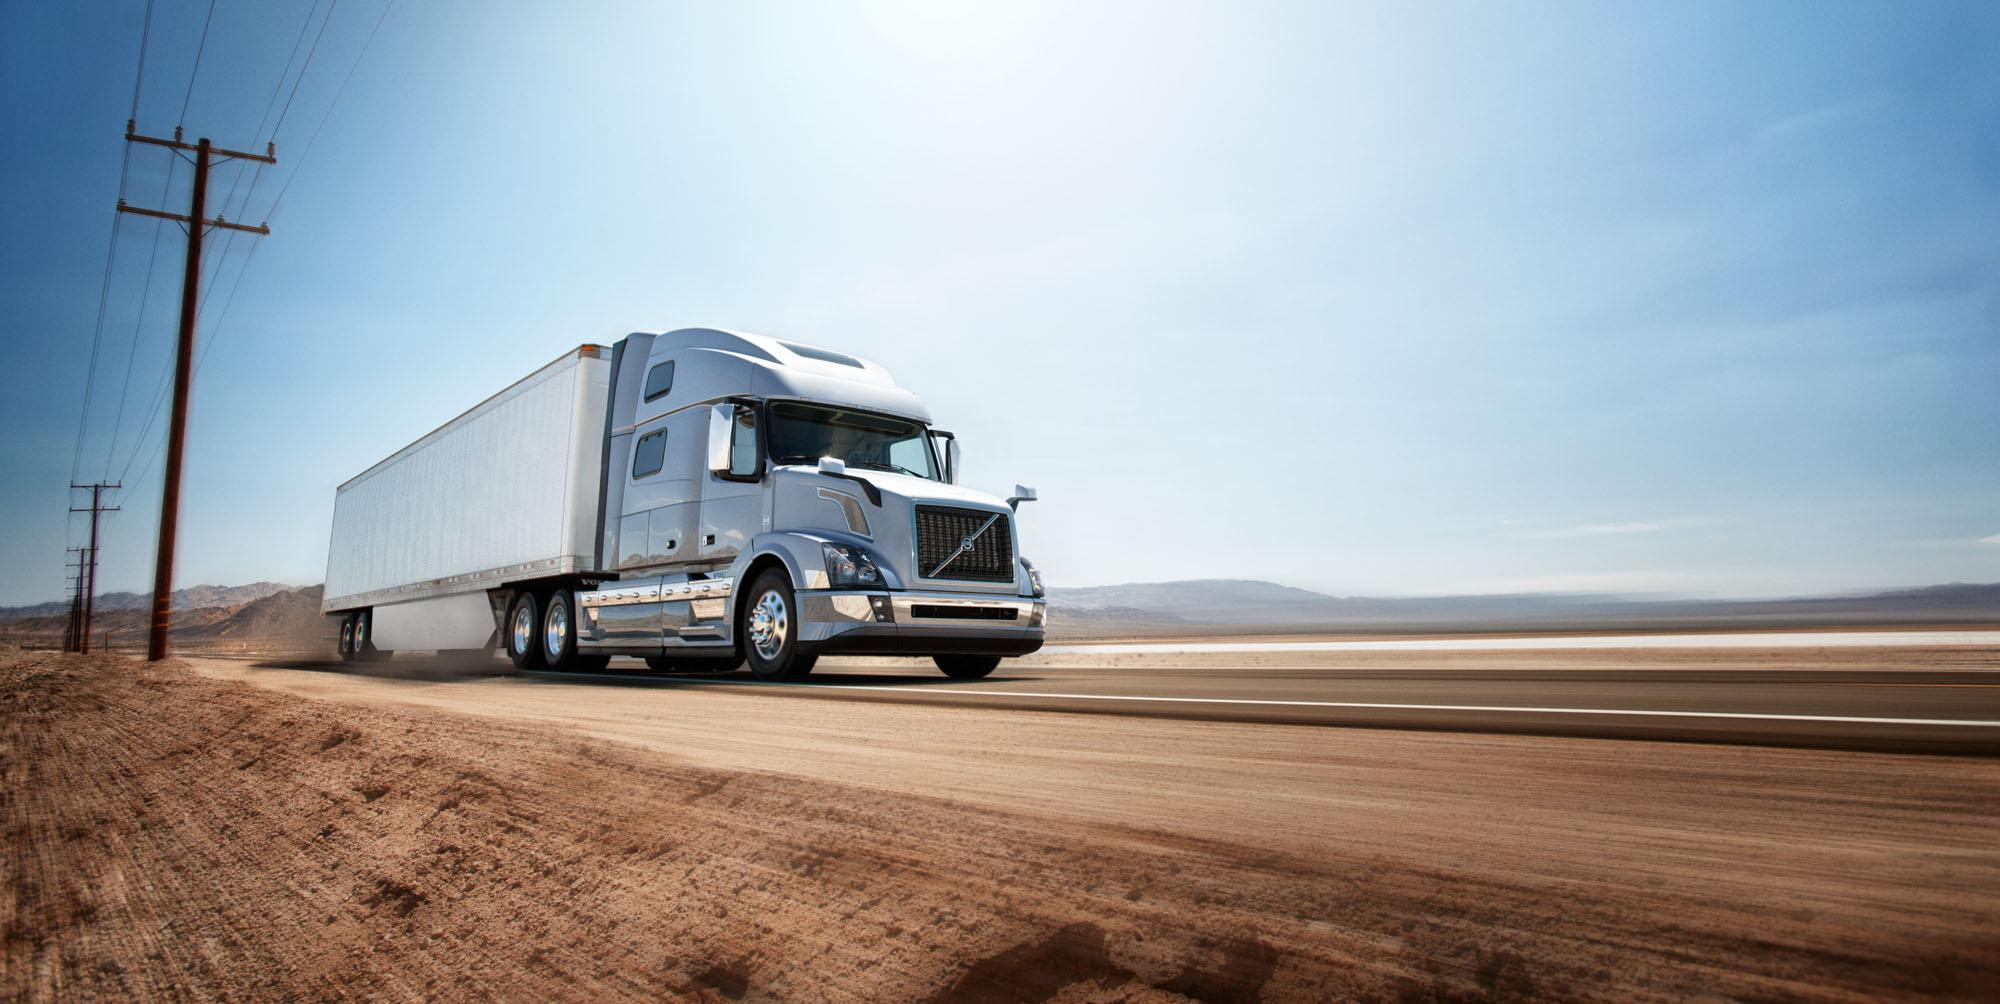 trucking pic 03.jpg